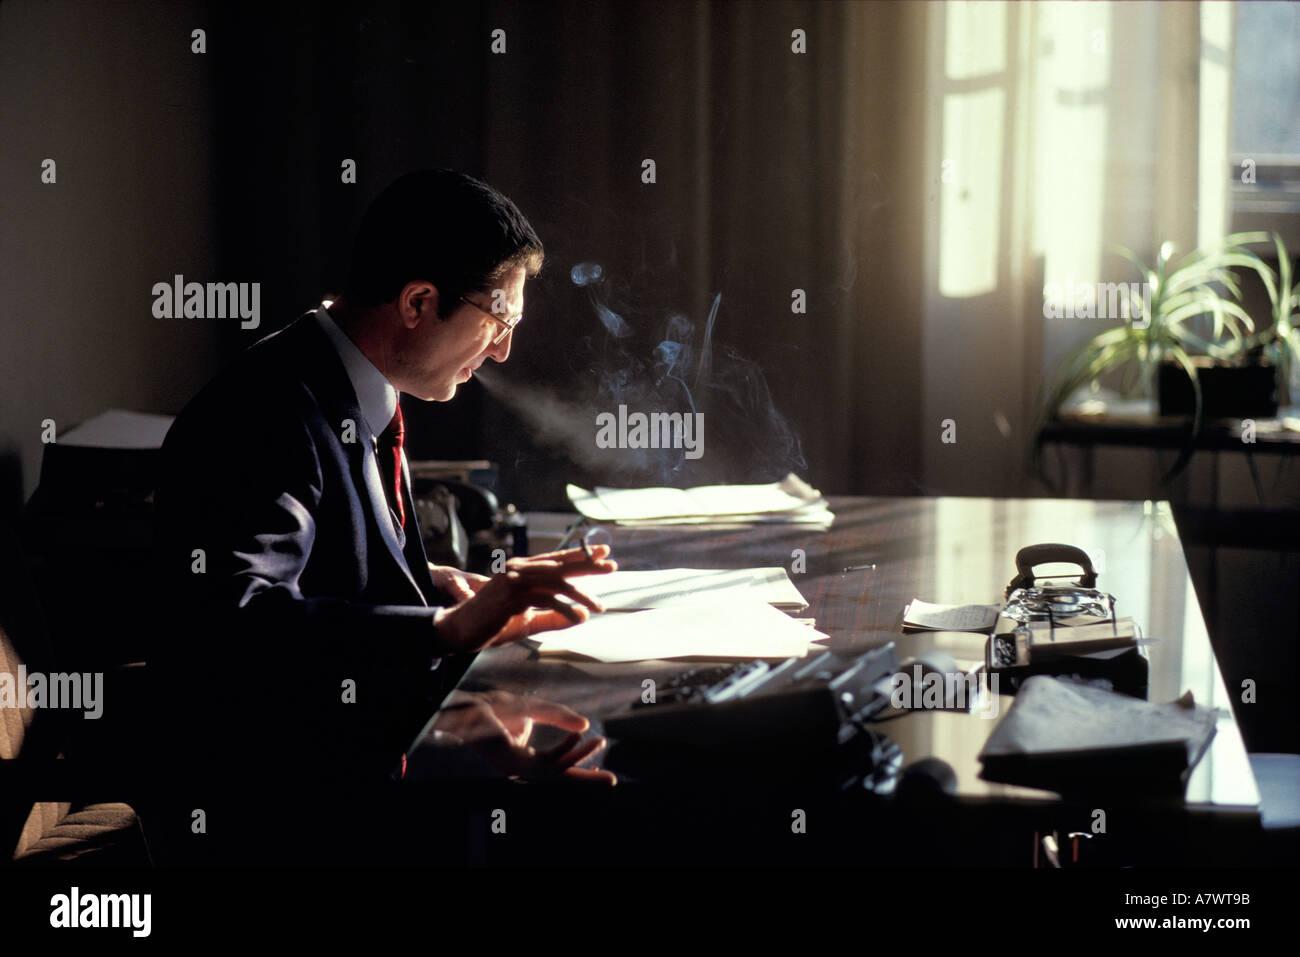 sunlight window office executive worker smoke smoking desk organize. Black Bedroom Furniture Sets. Home Design Ideas